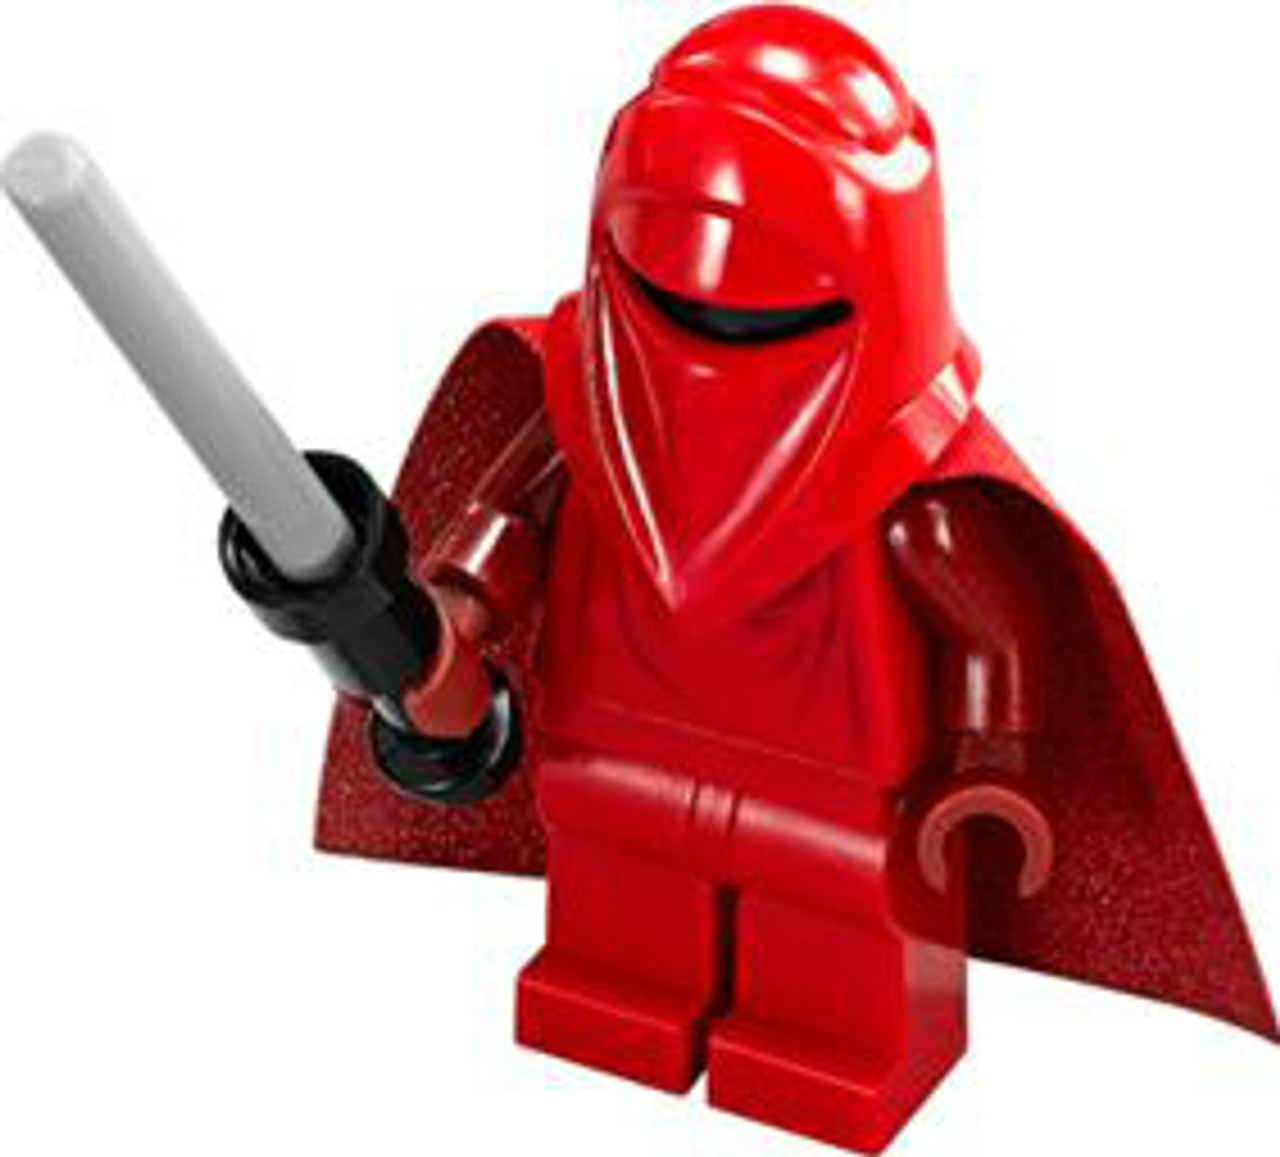 Lego STAR WARS minifig Imperial ROYAL GUARD Emporer